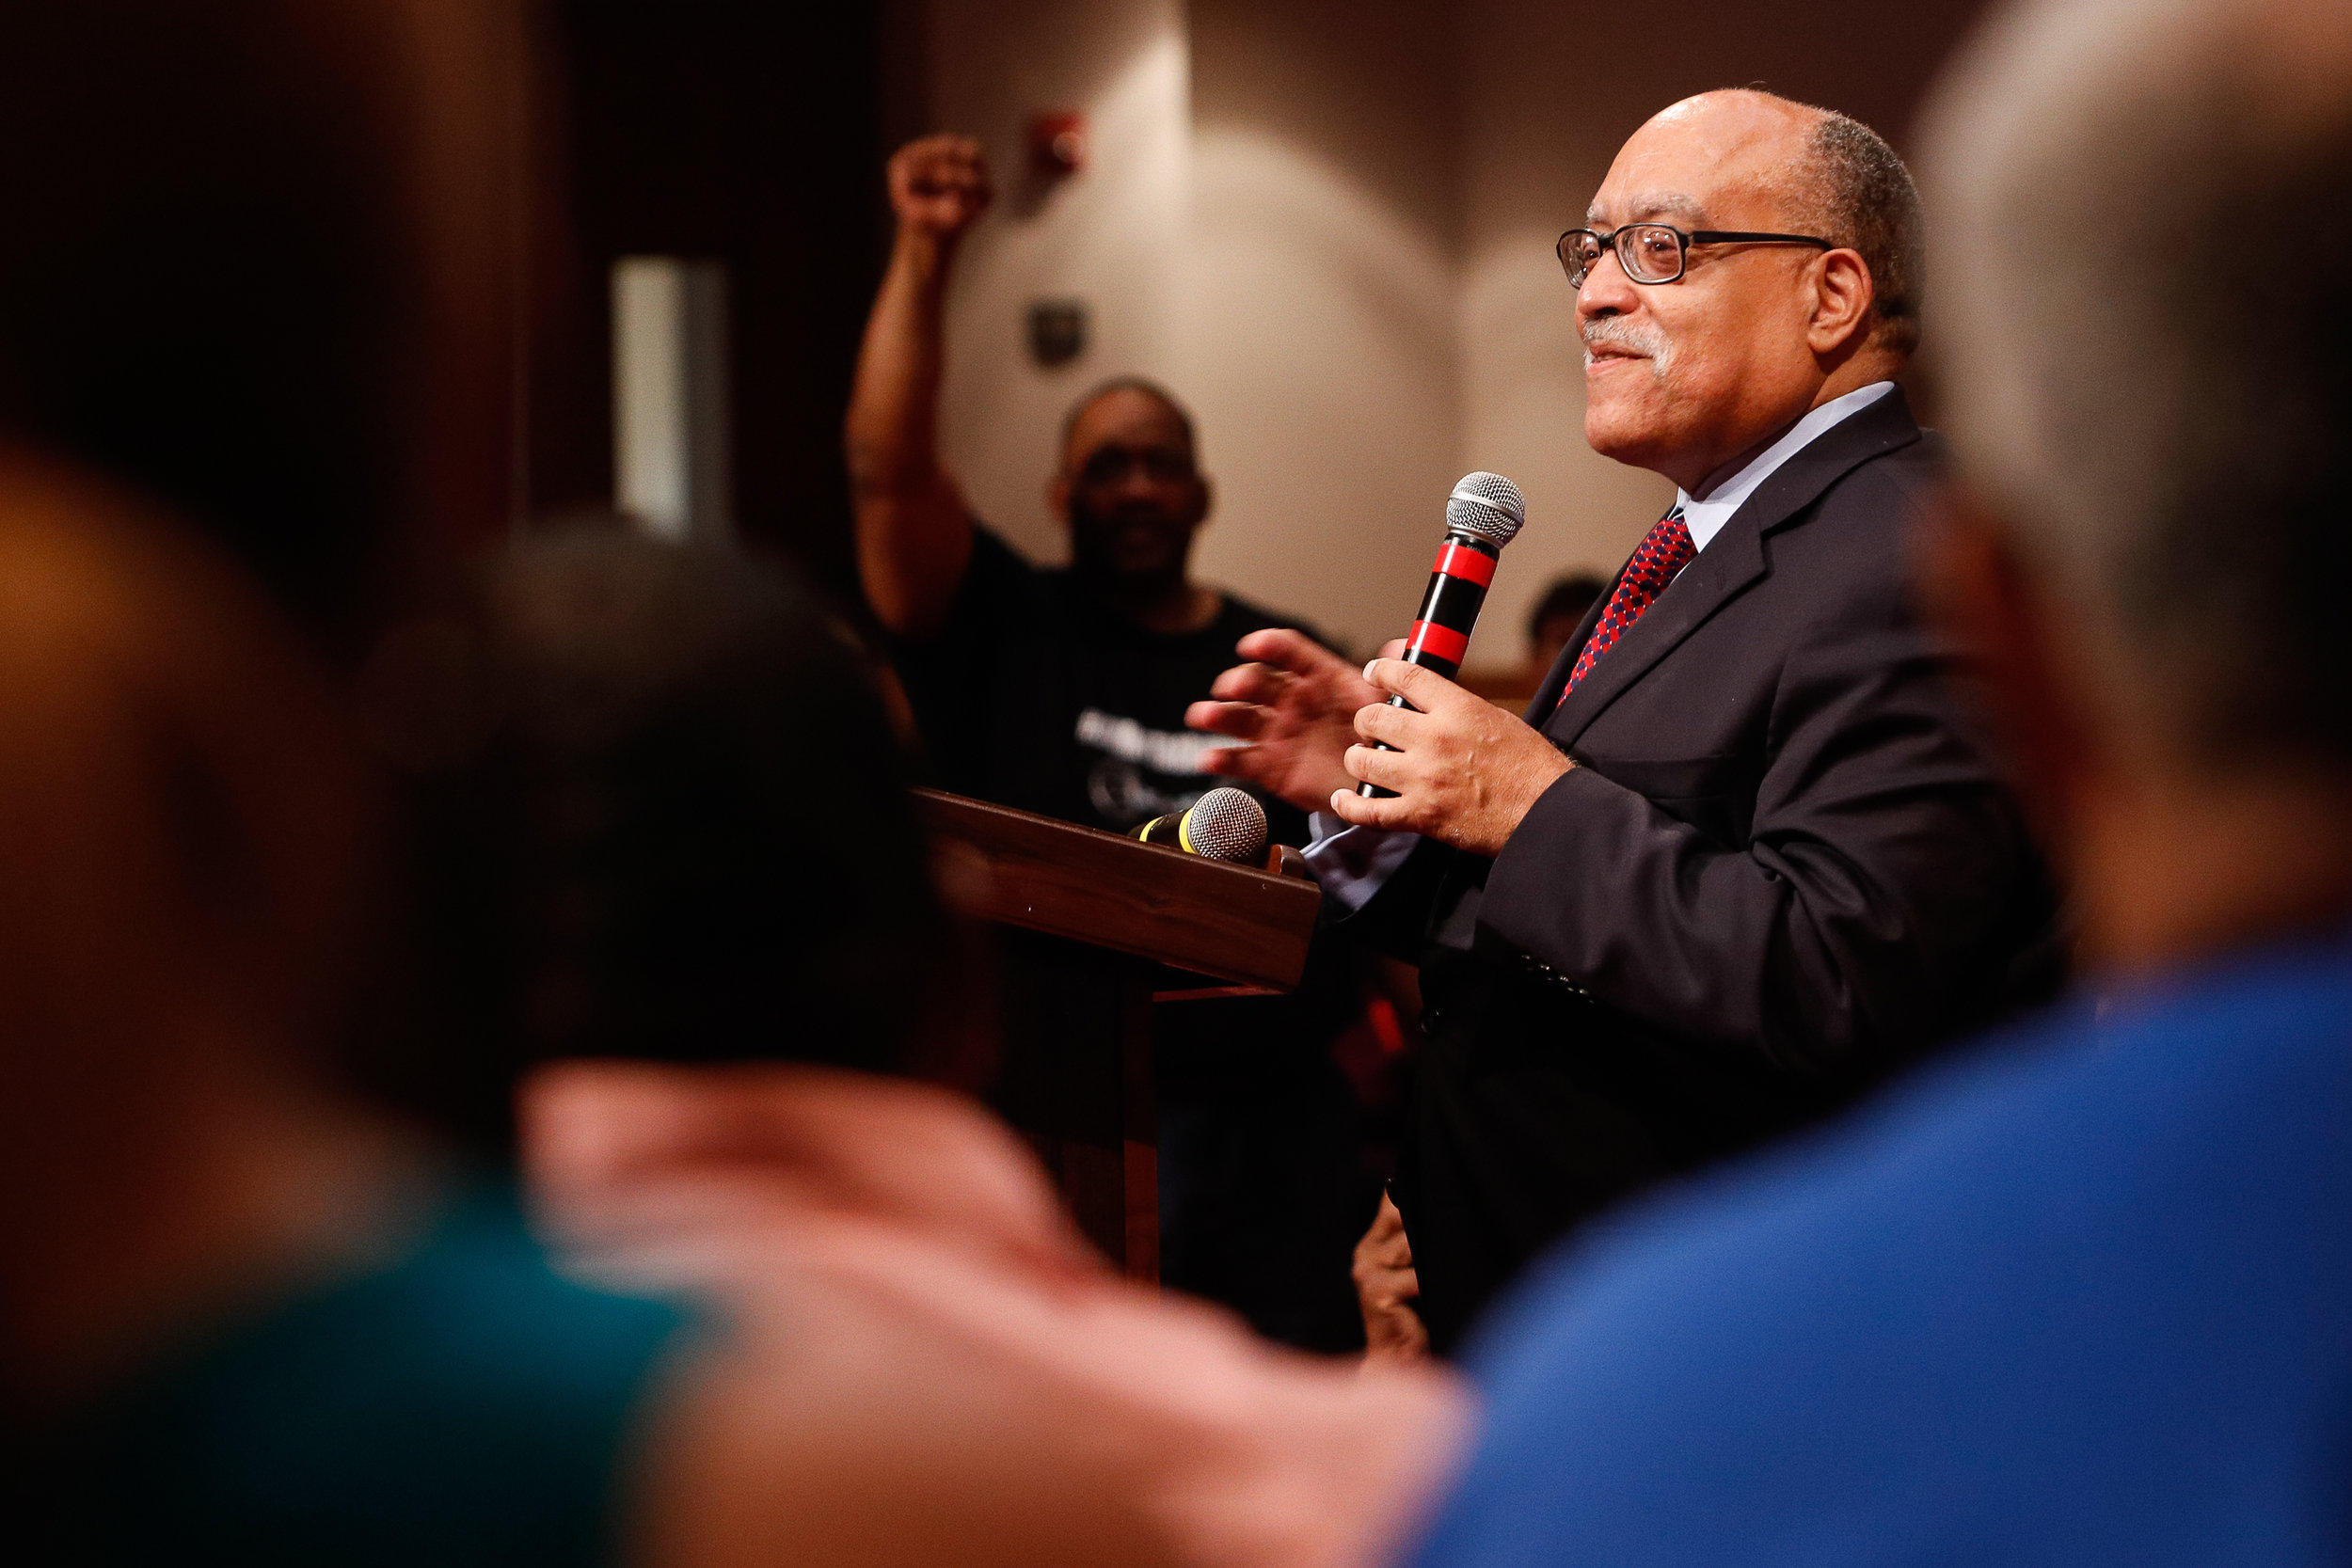 Georgia State Senator Vincent Fort speaks at his campaign rally for mayor of Atlanta at the Saint Philip AME Church in Atlanta, Ga., on Saturday, Sept. 30, 2017.